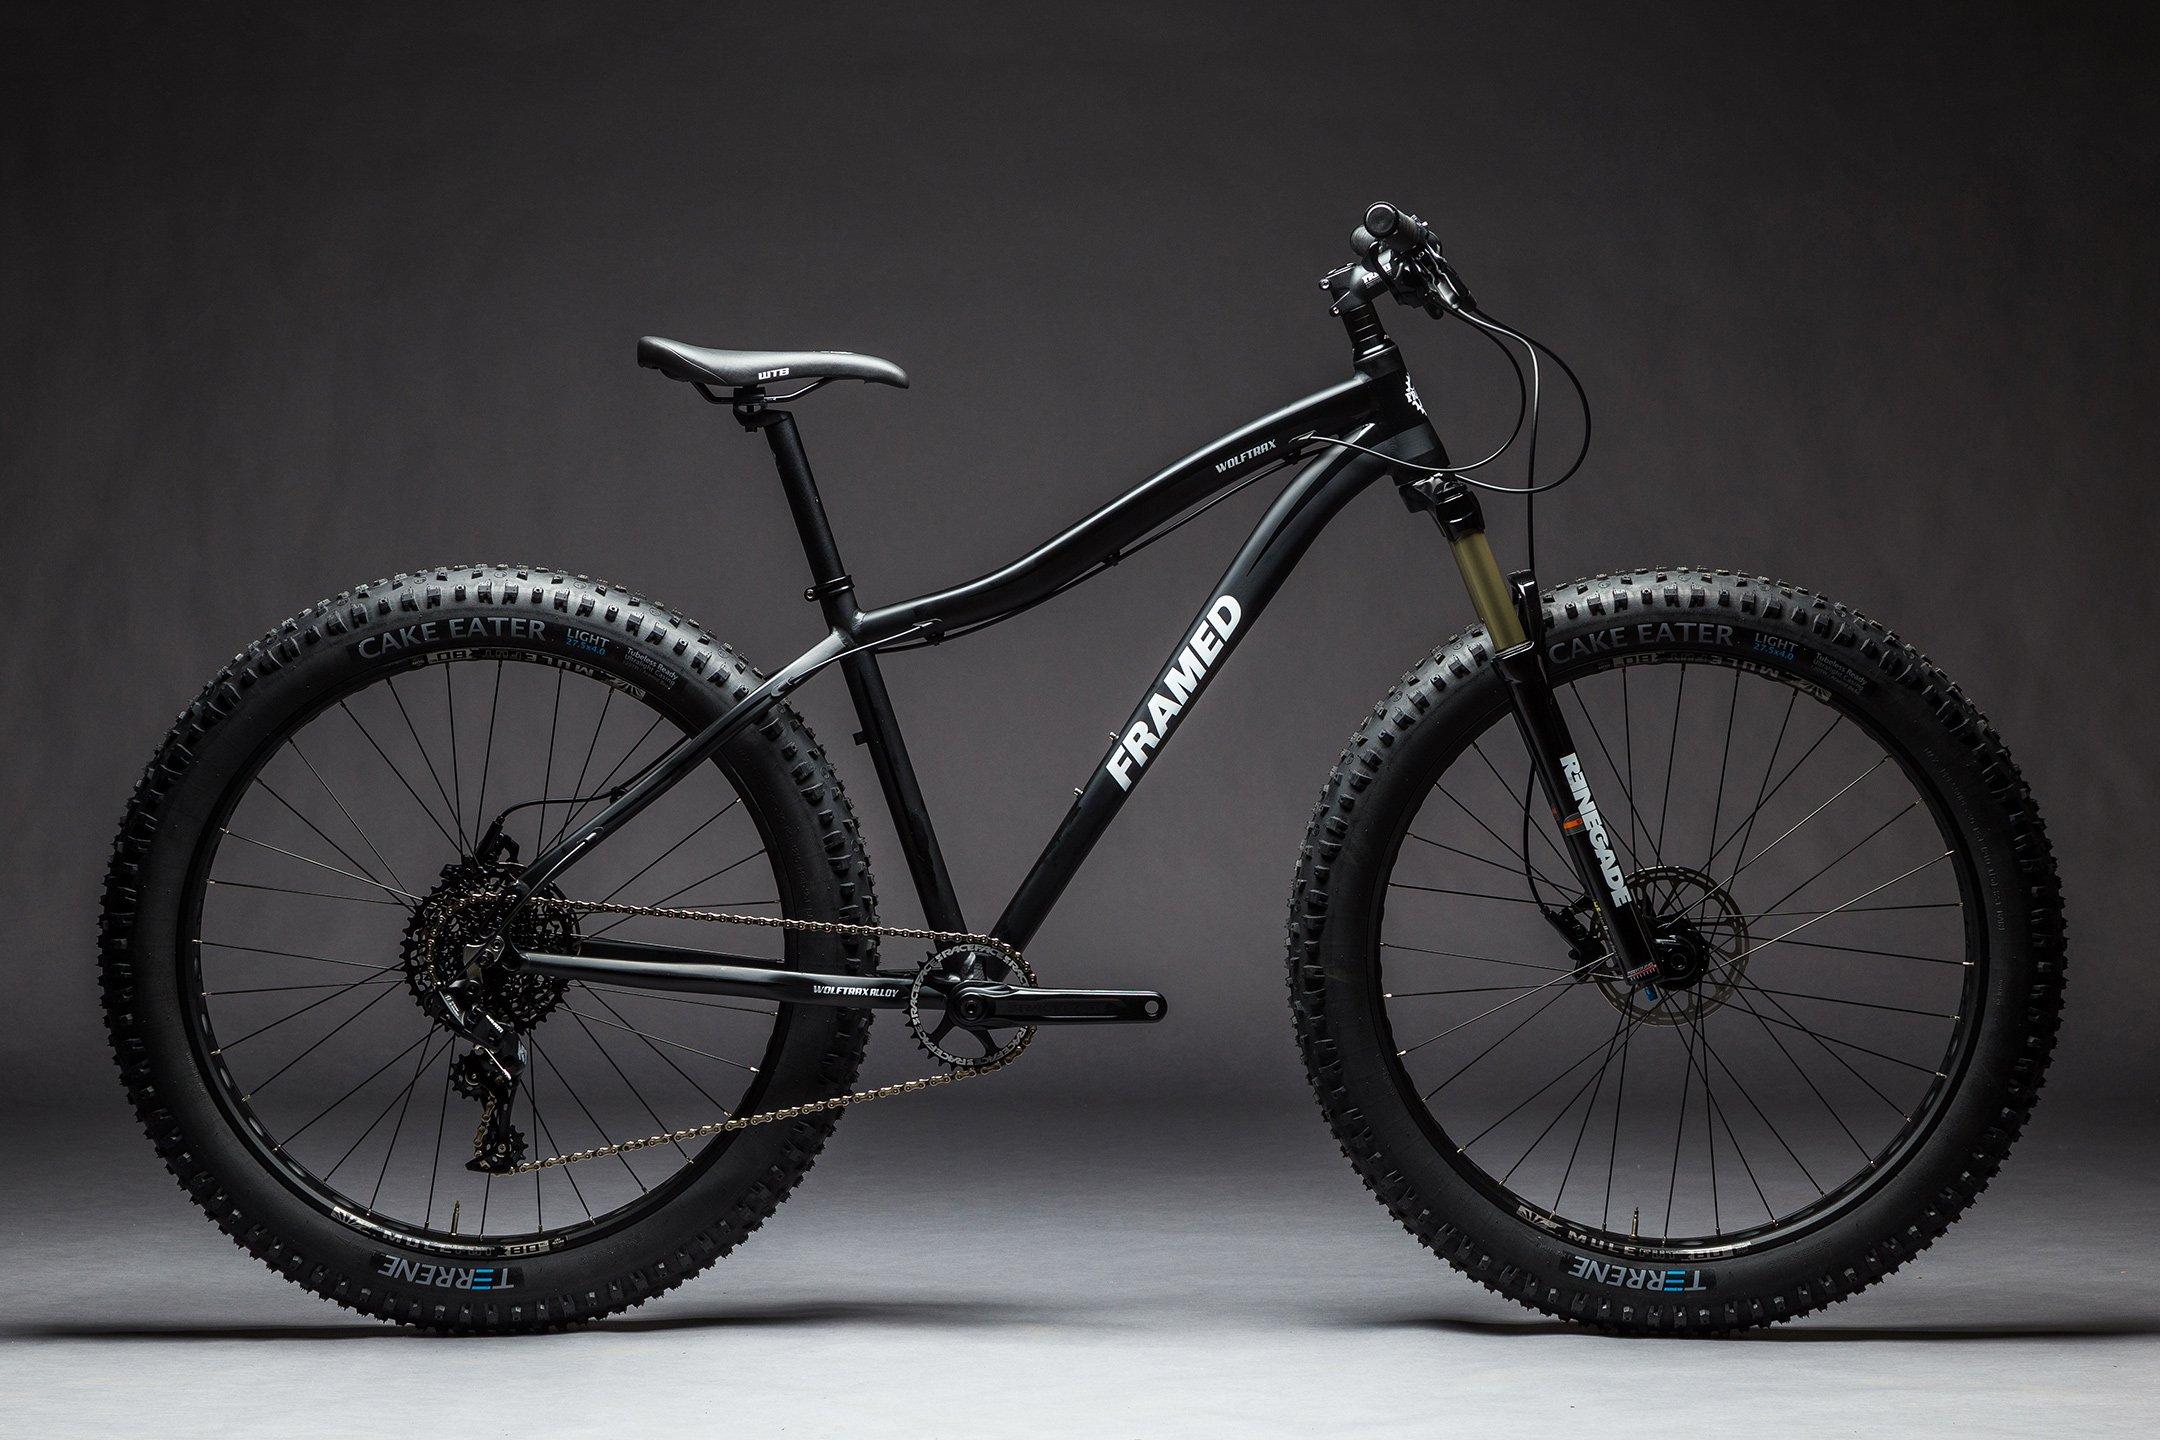 Buyer's Guide: Budget Fat Bikes Under $1500 - Singletracks